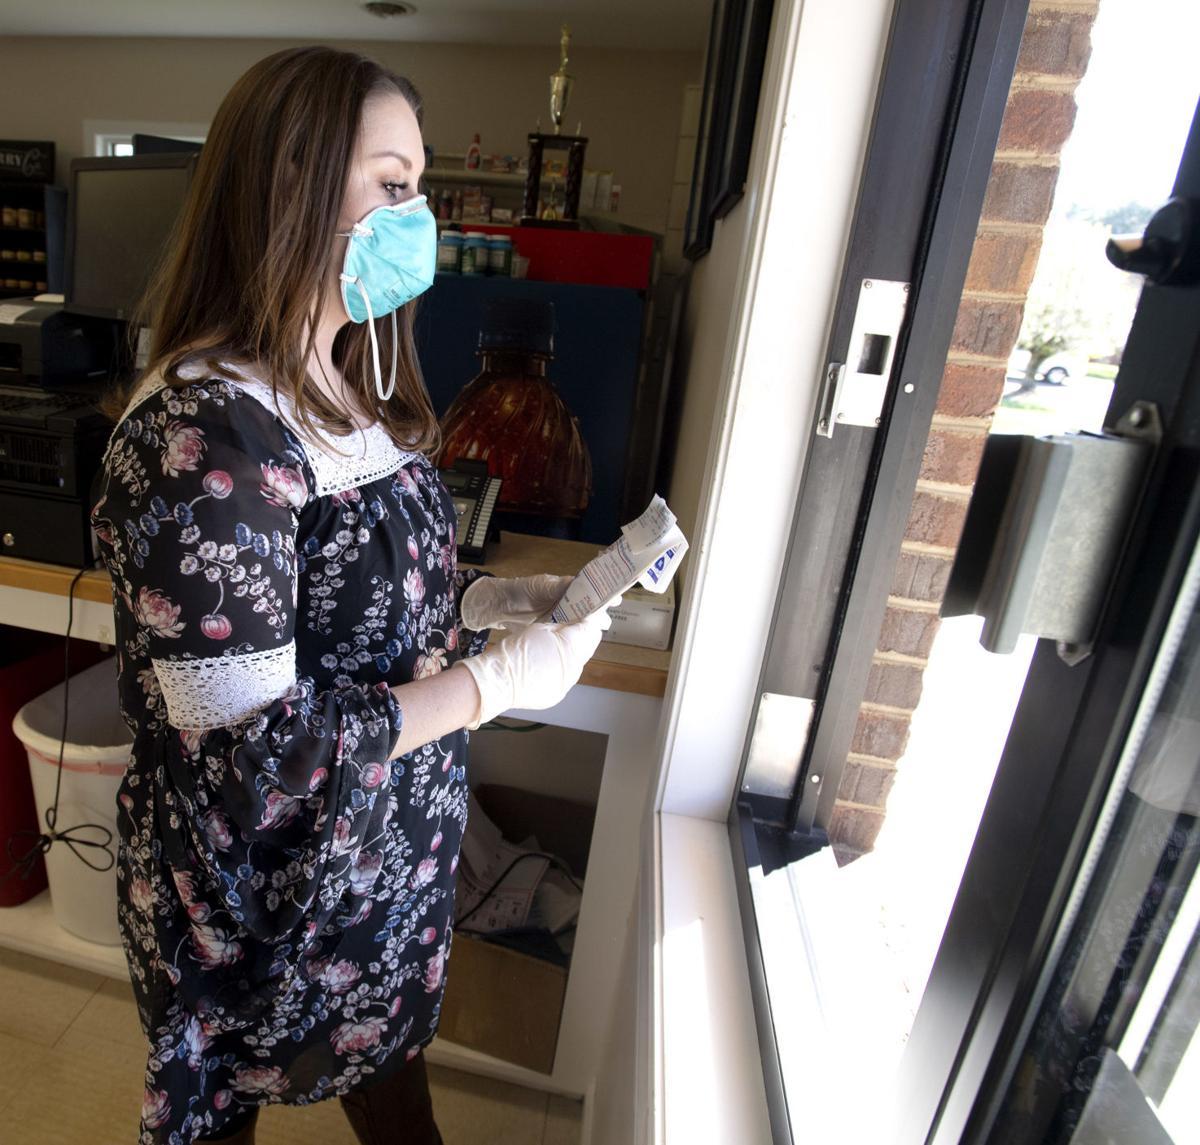 BHC 03272020 Essential Workers during Coronavirus 02